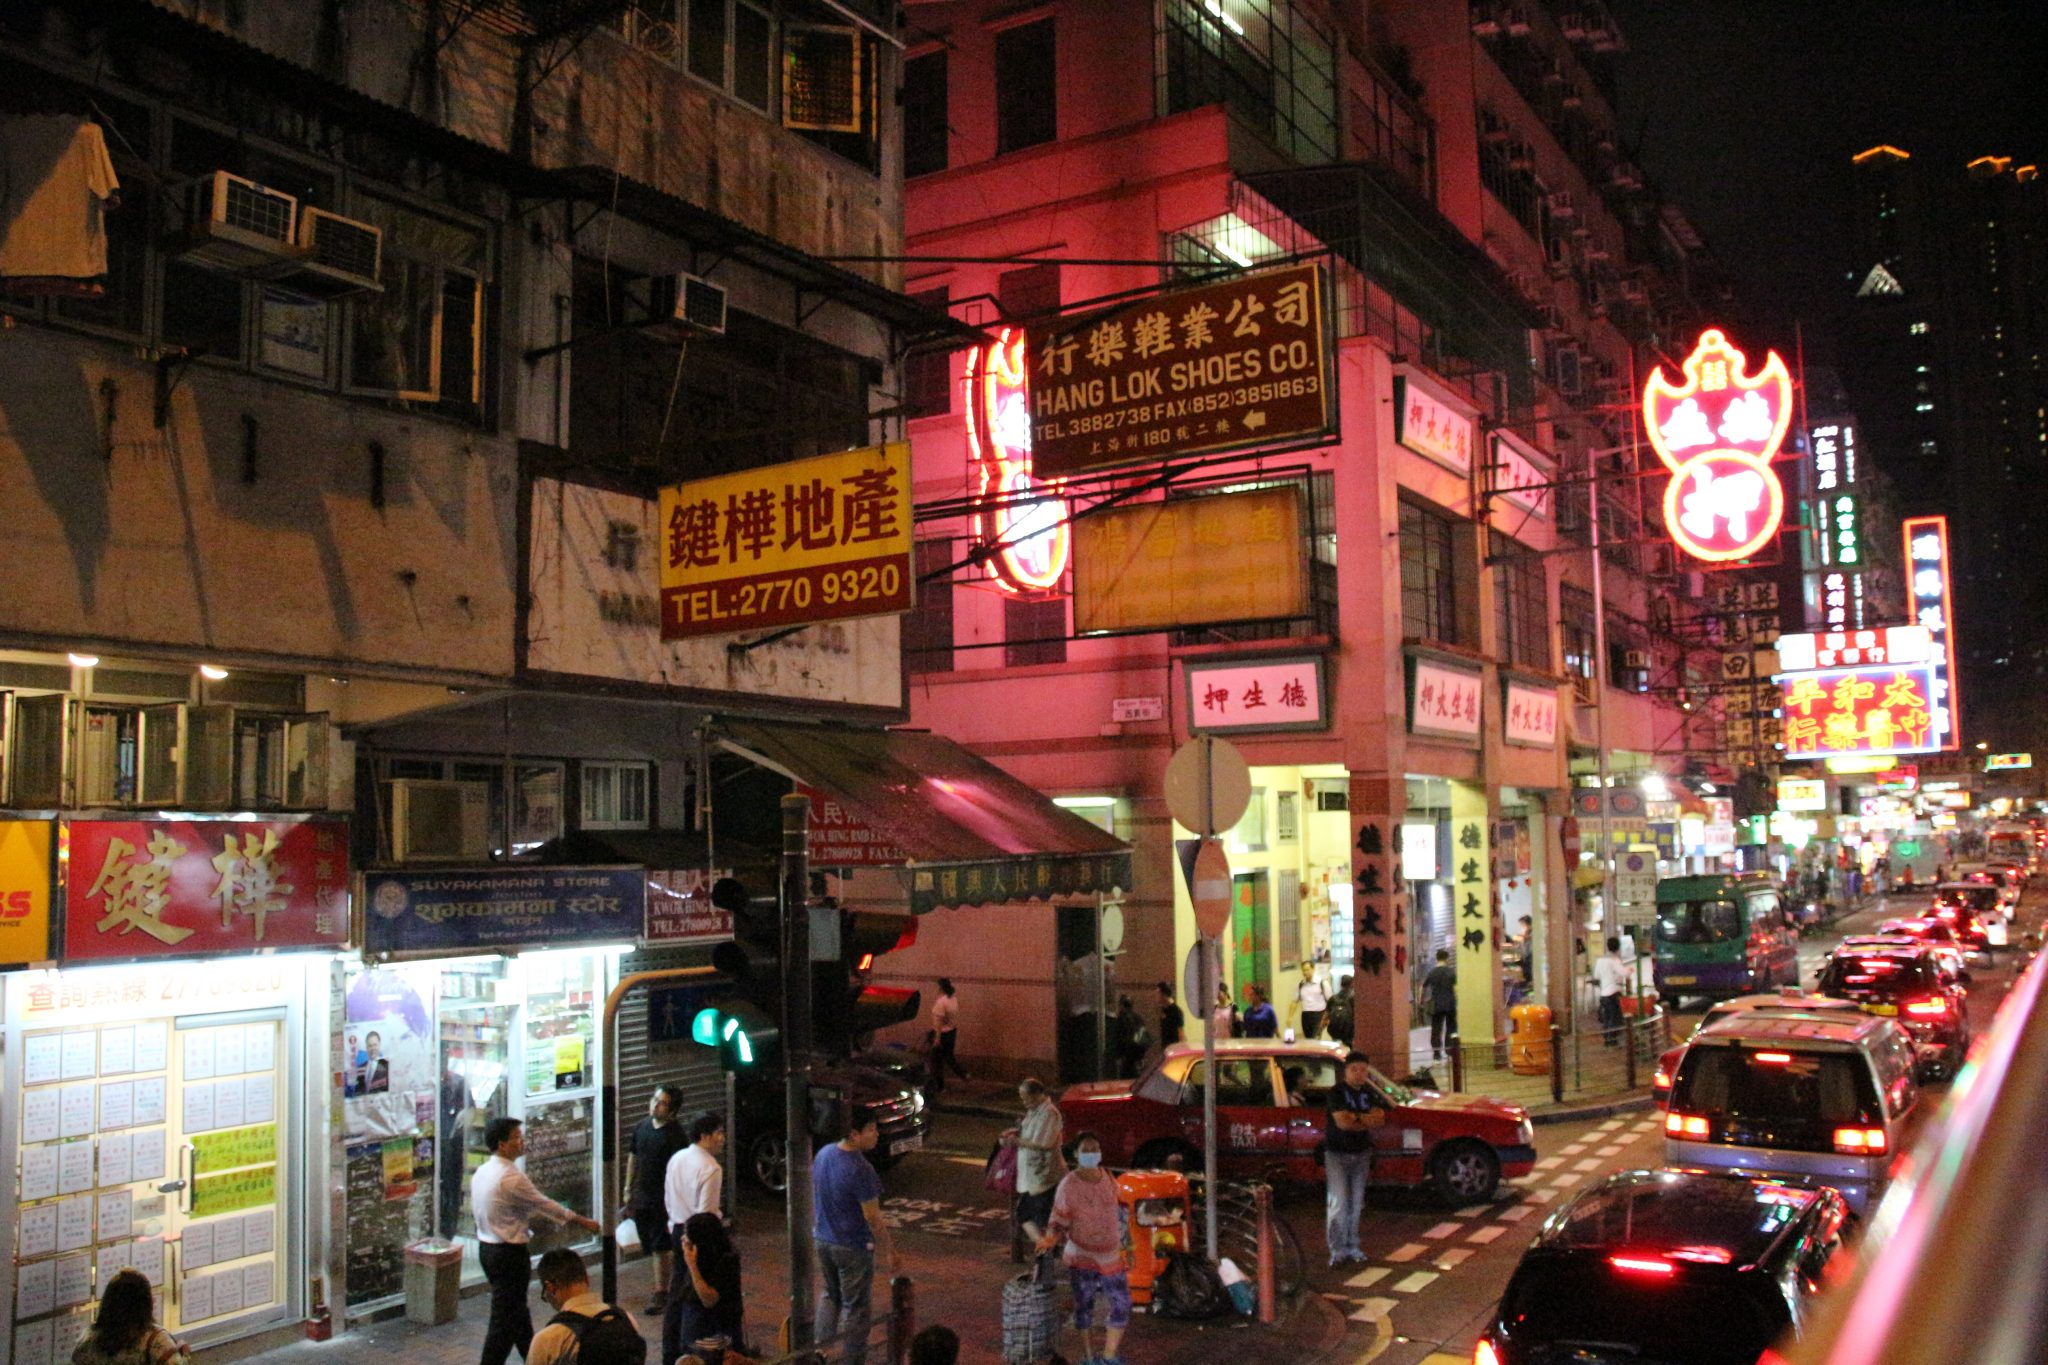 Kowloon street on evening bus tour